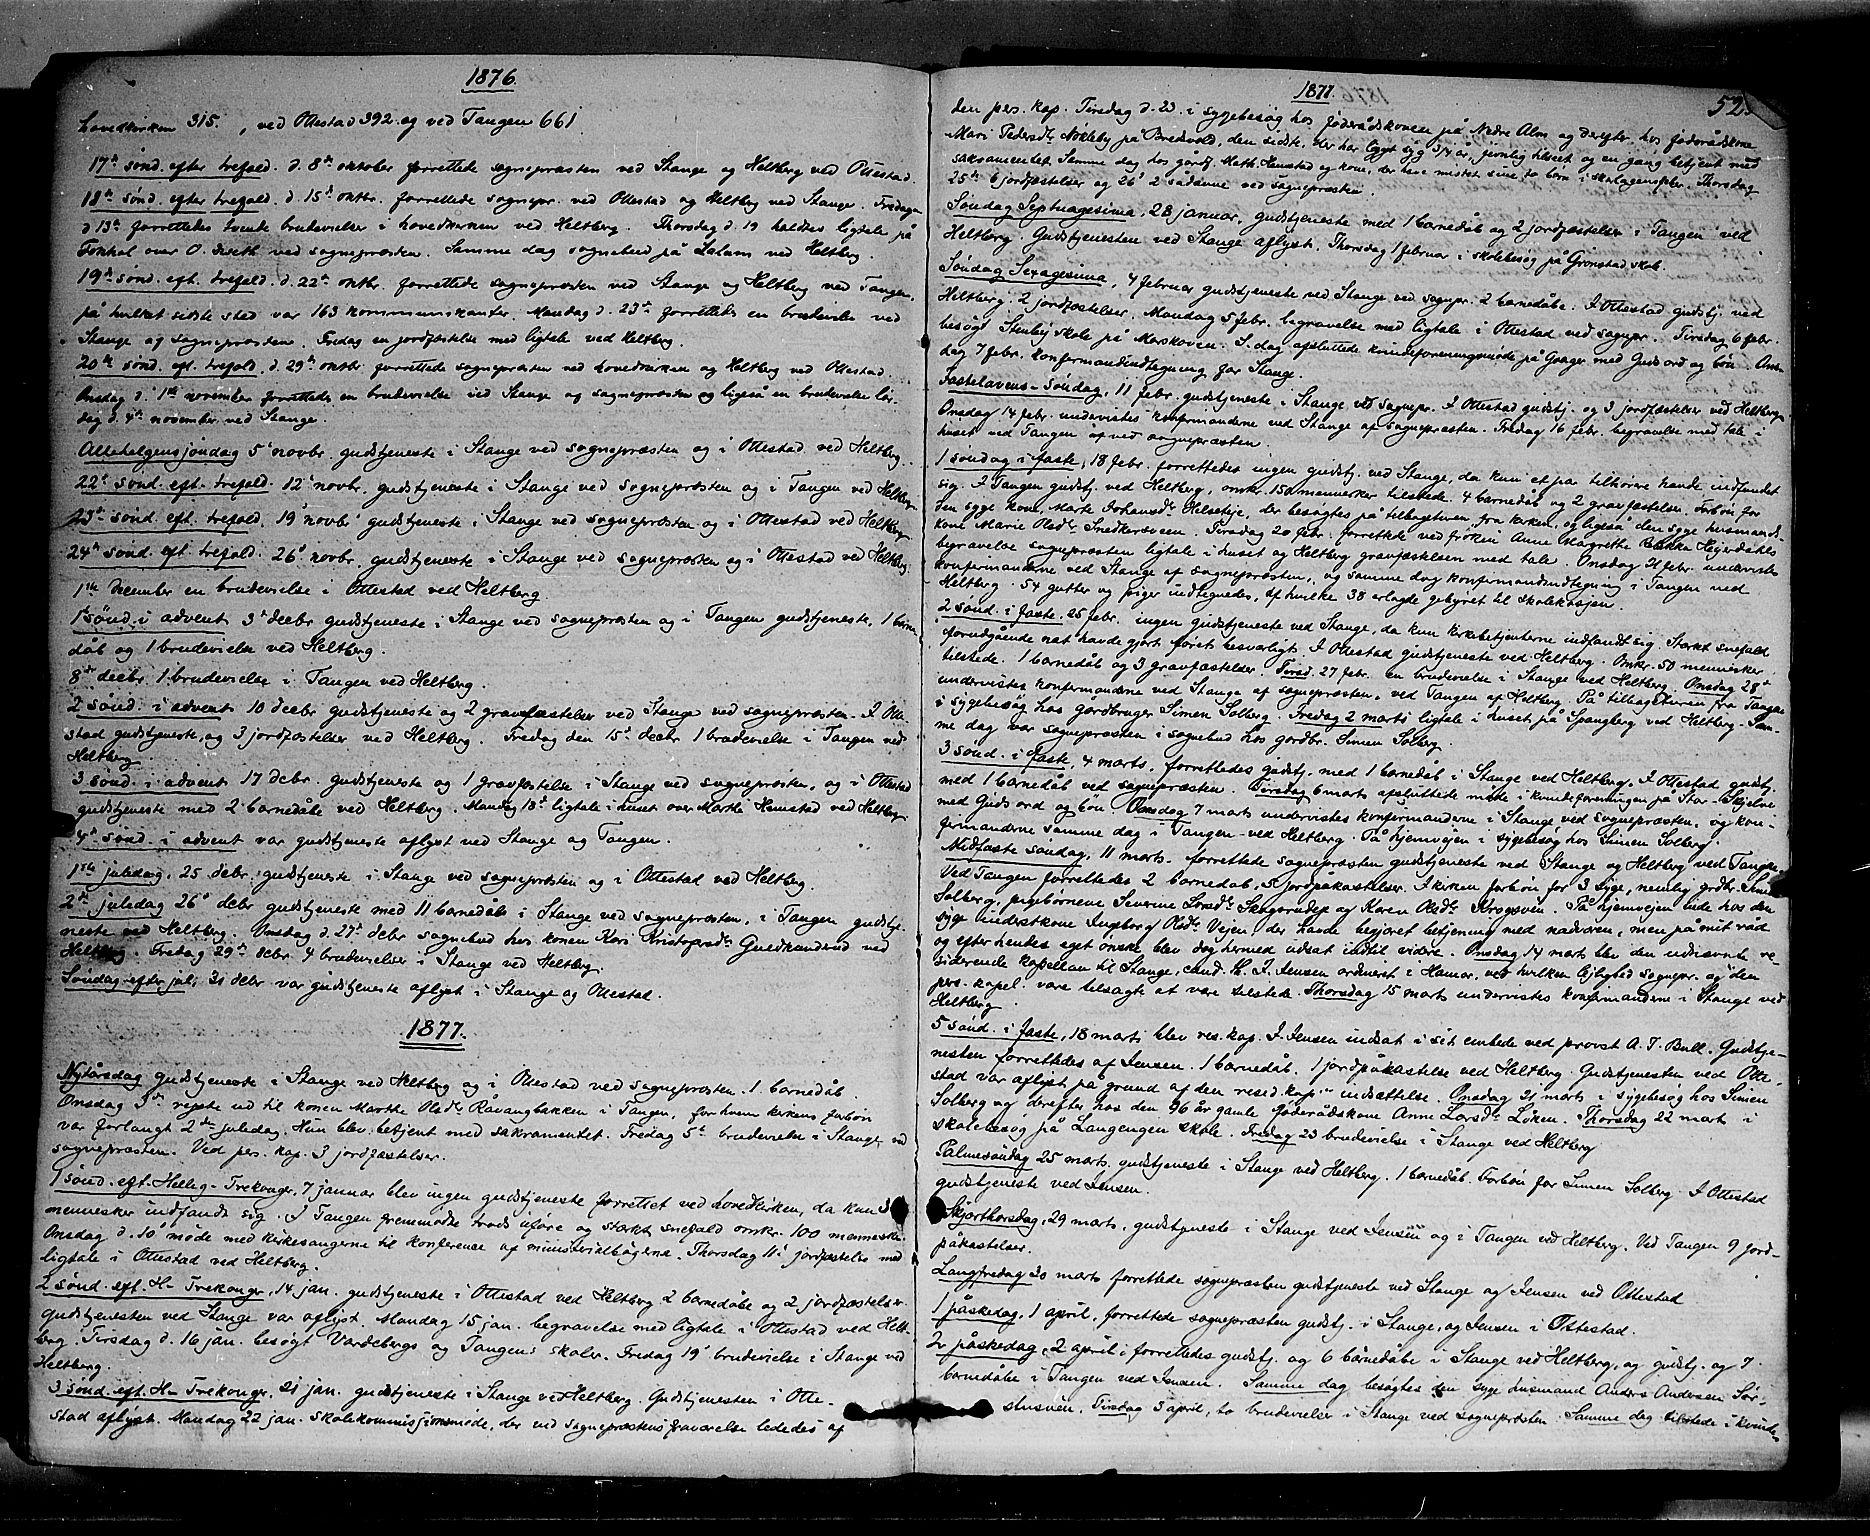 SAH, Stange prestekontor, K/L0013: Ministerialbok nr. 13, 1862-1879, s. 525